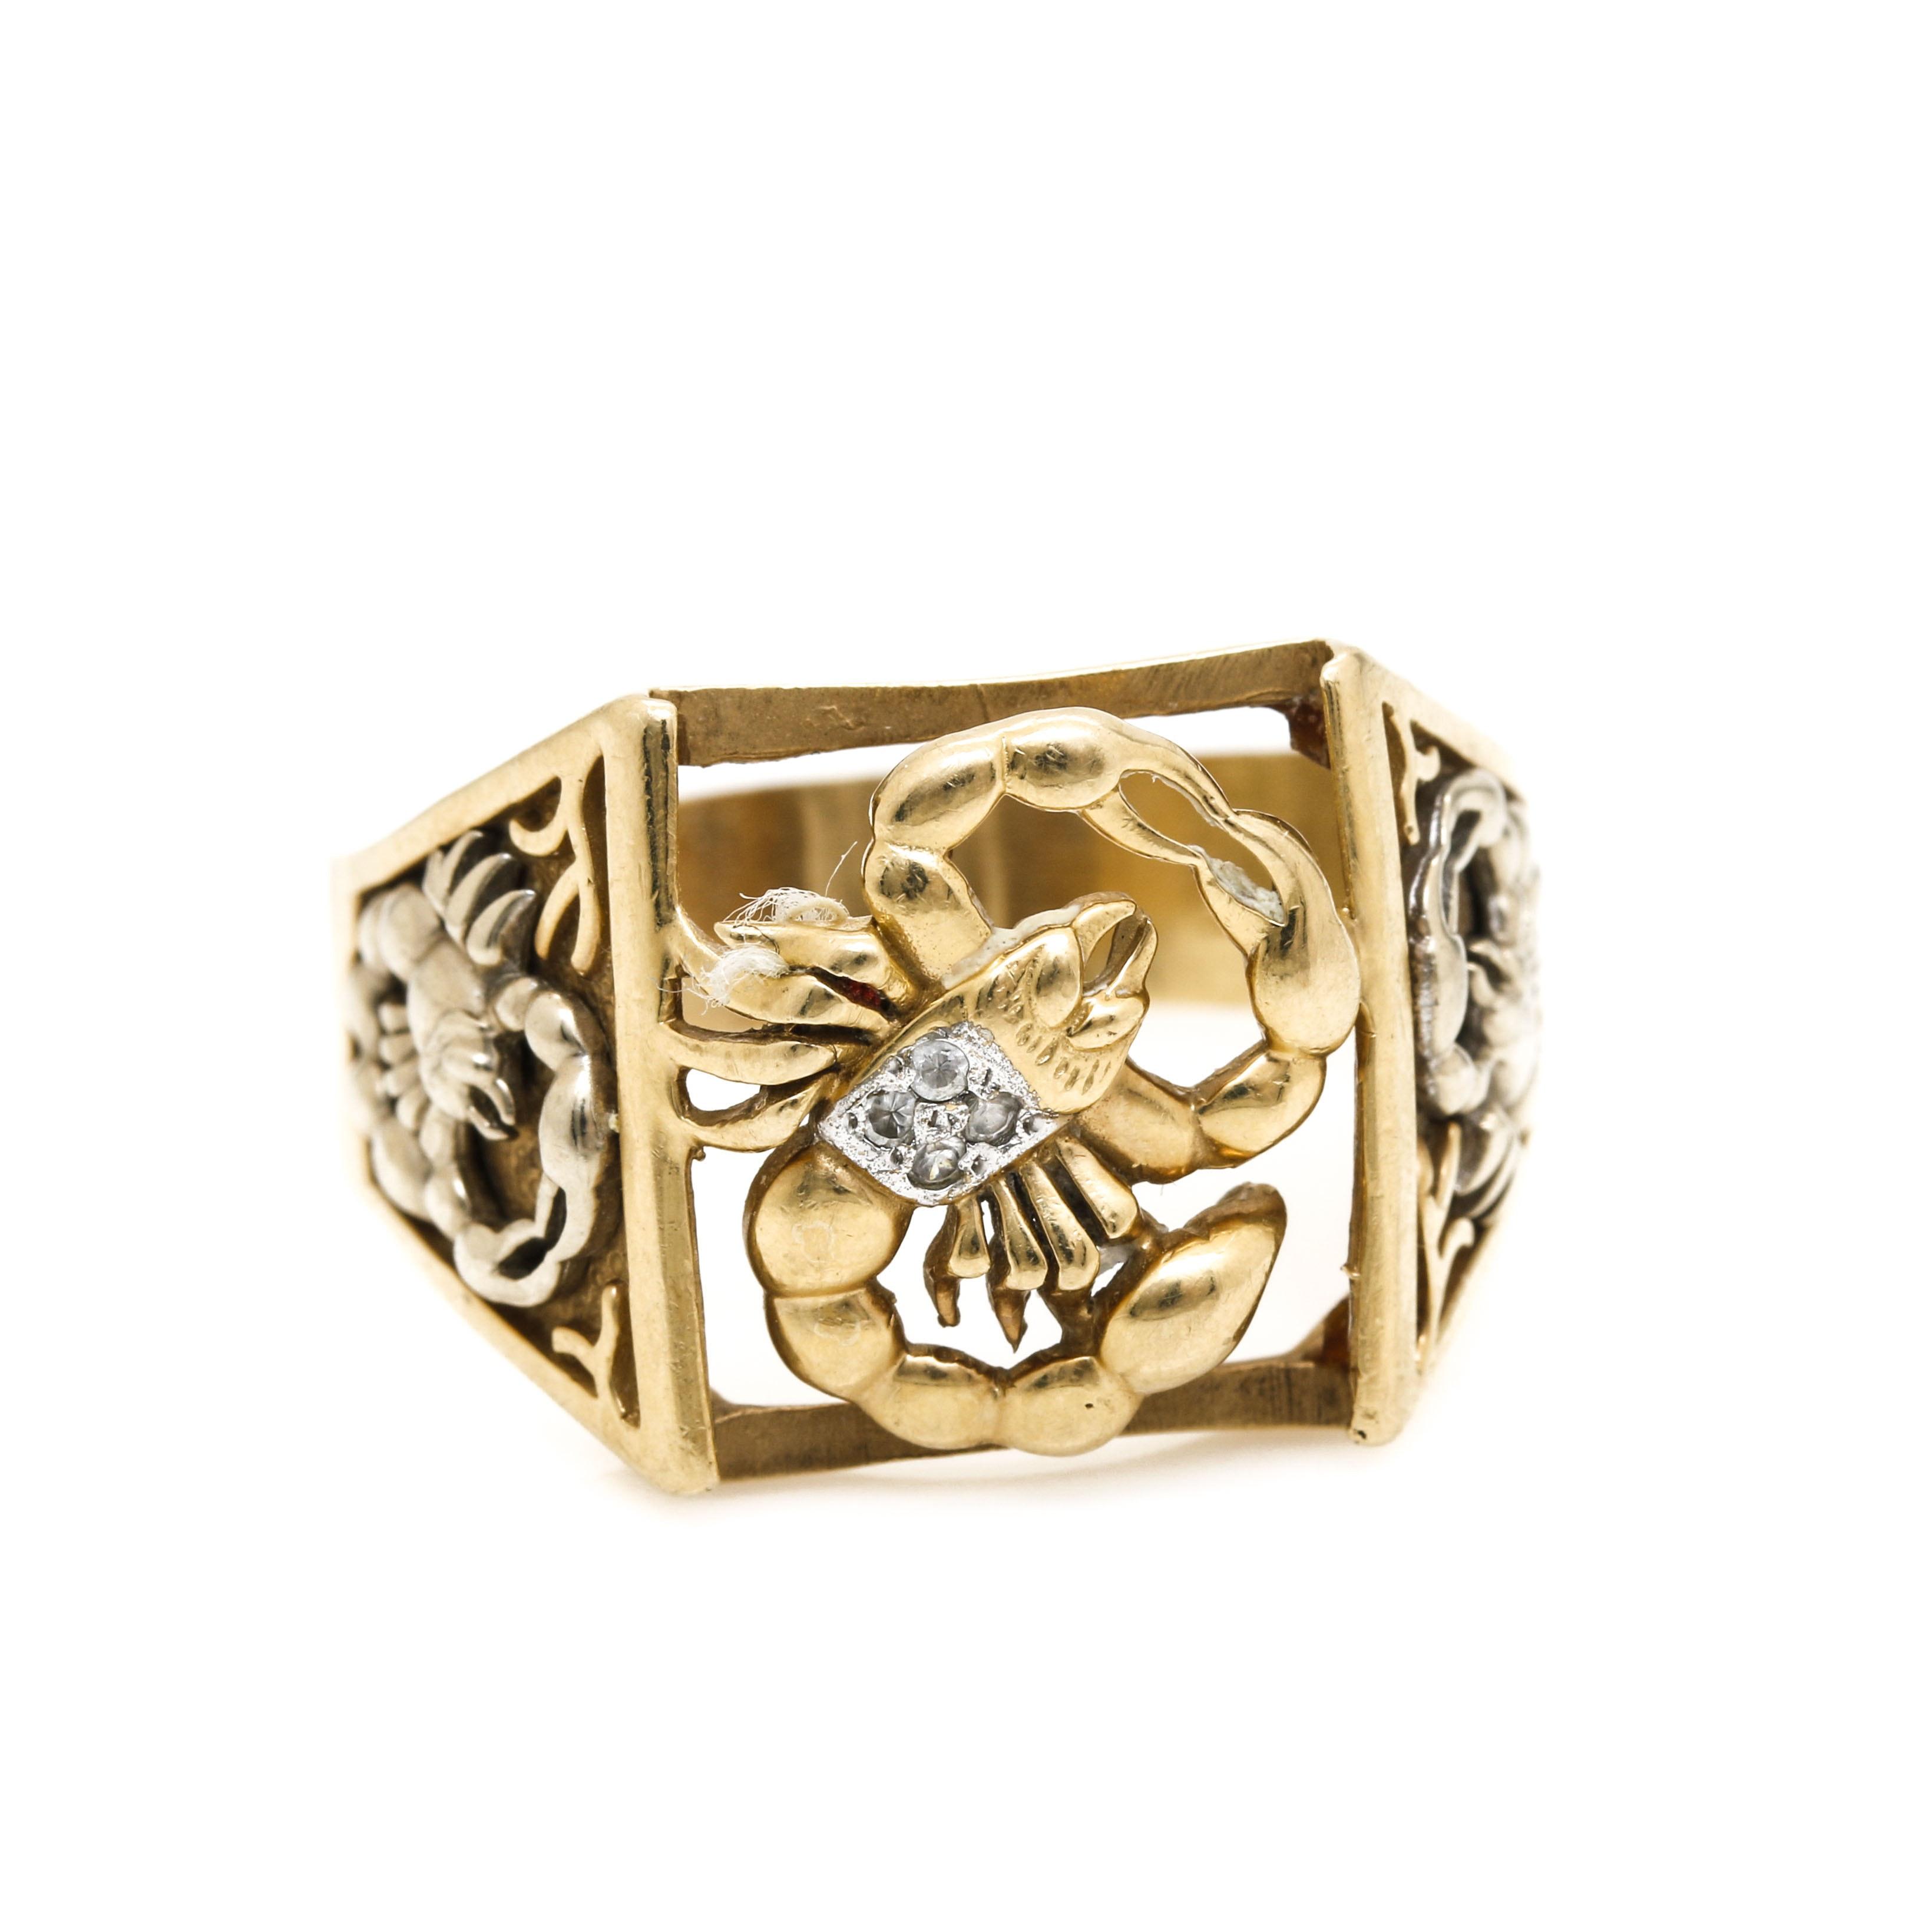 14K Yellow Gold Scorpio Zodiac Motif Ring with White Topaz Accents